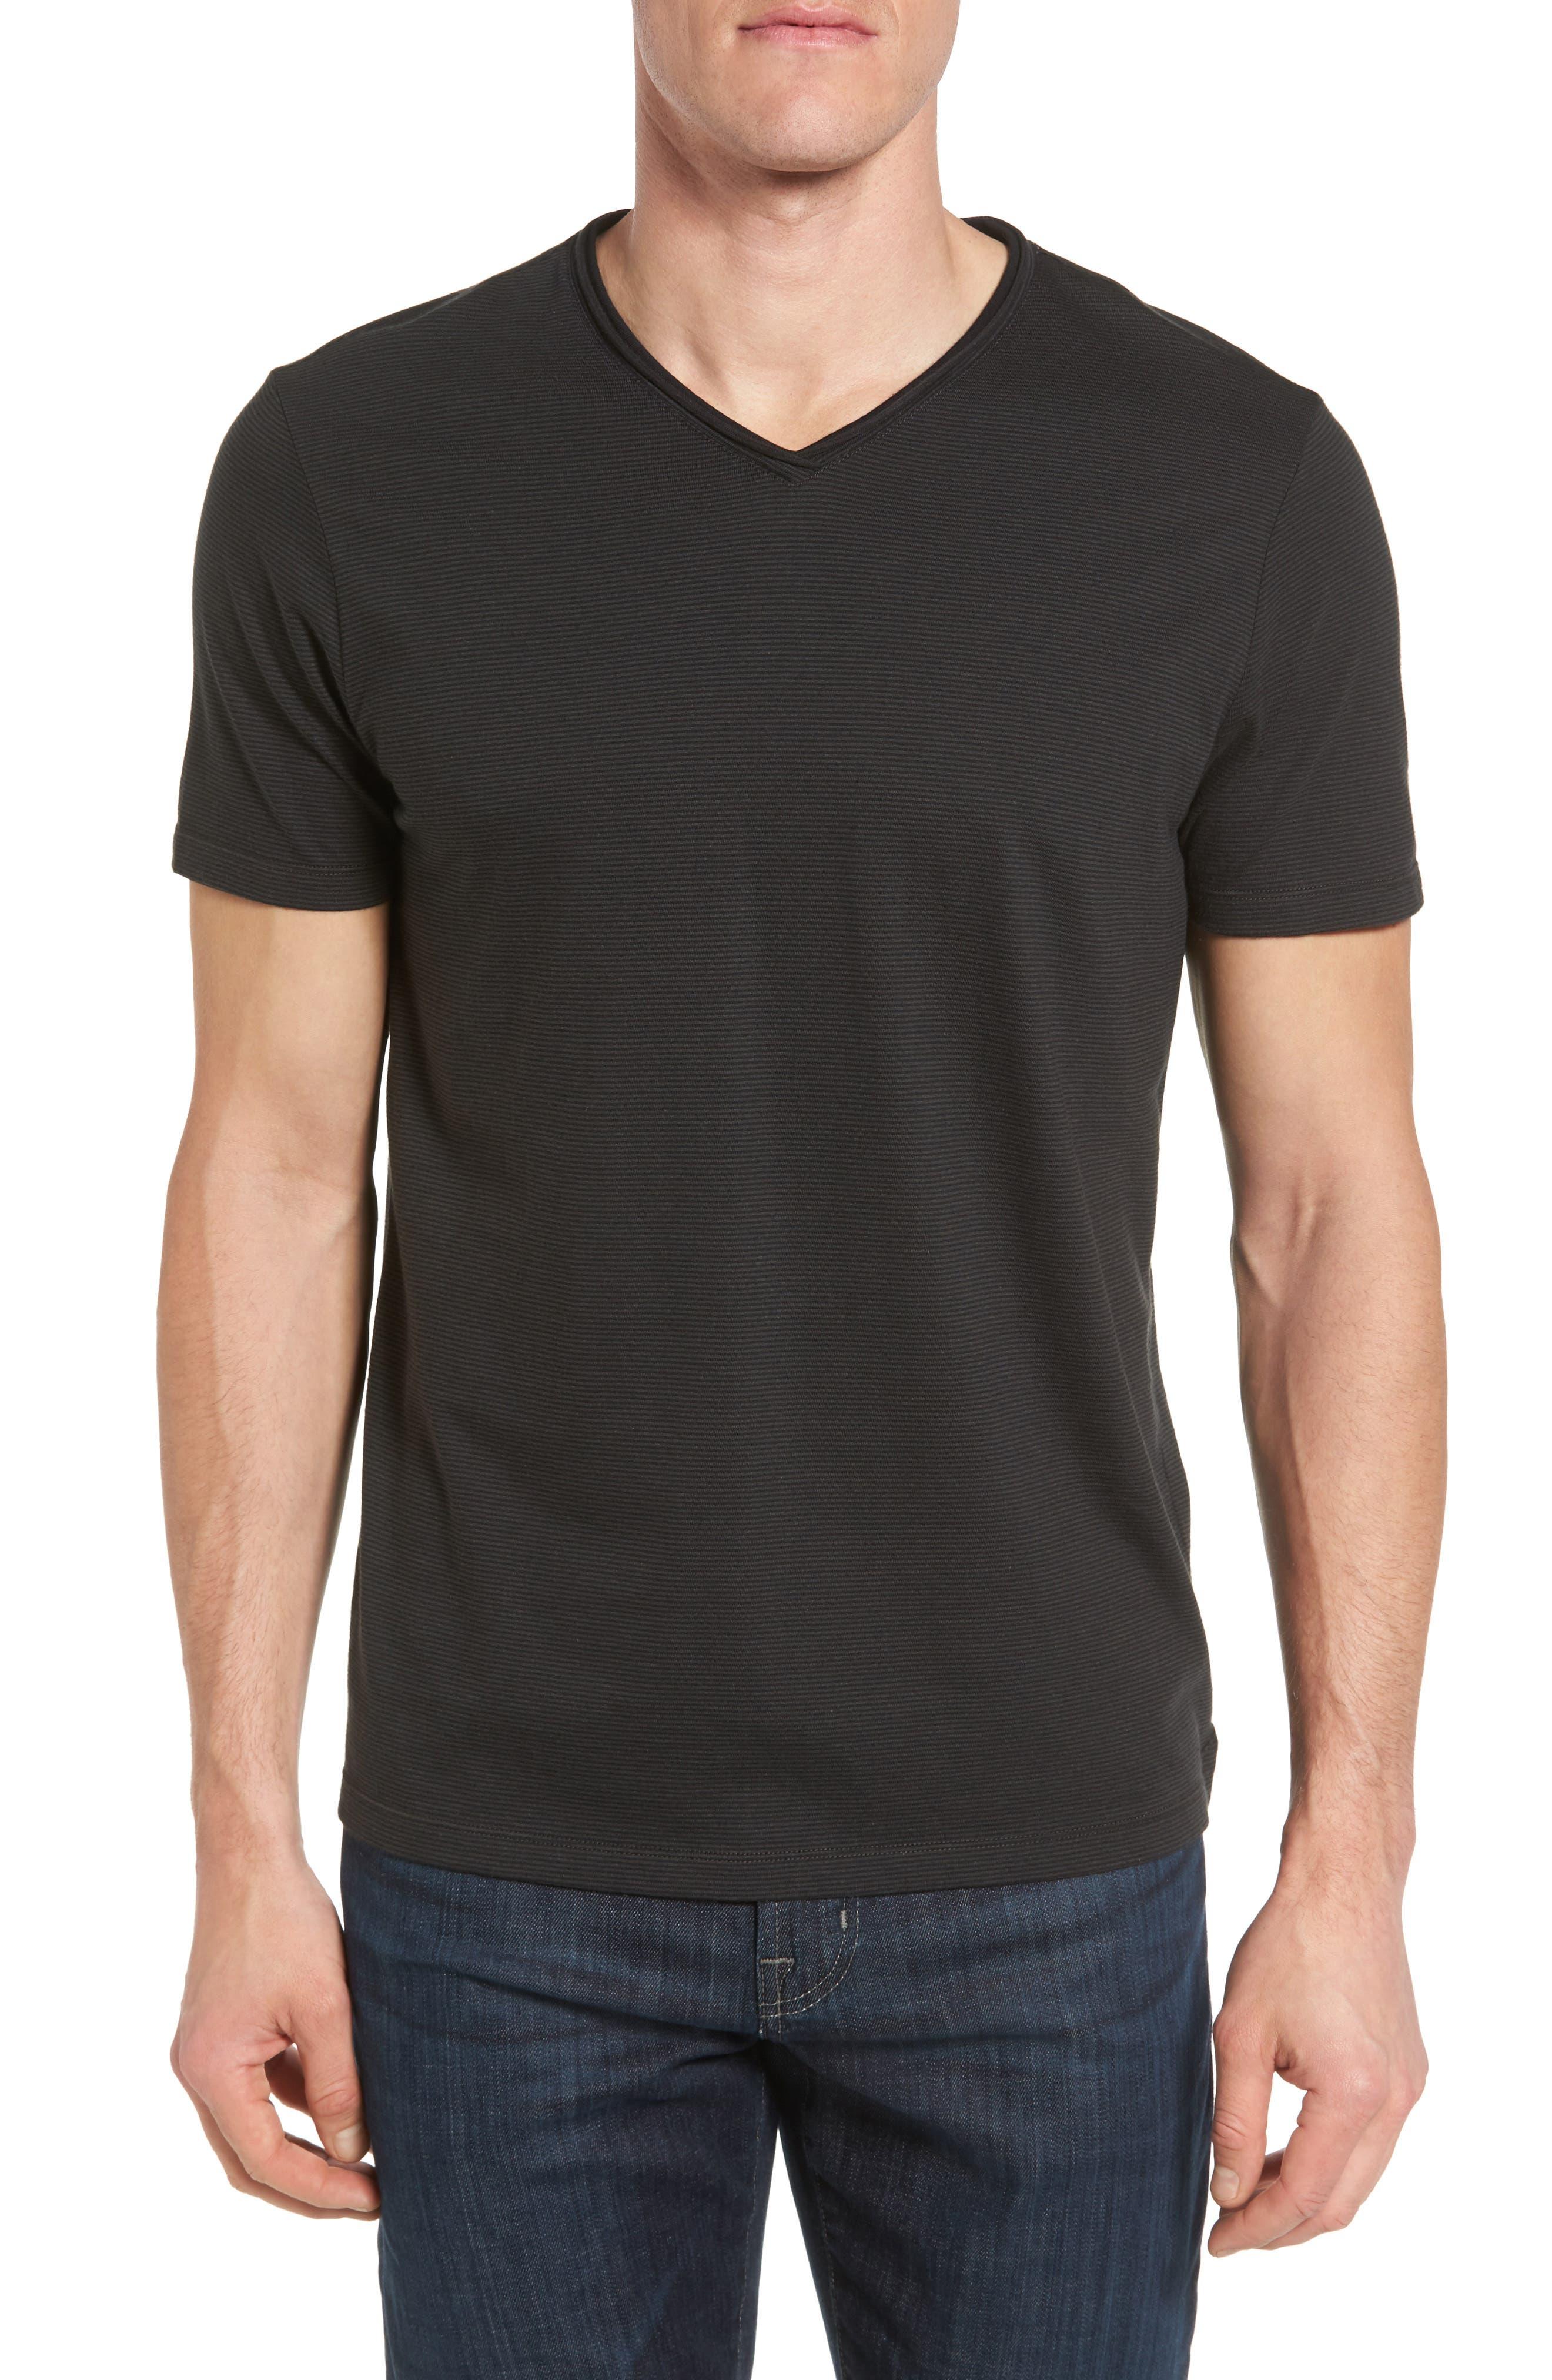 Robert Barakett Oslo V-Neck T-Shirt